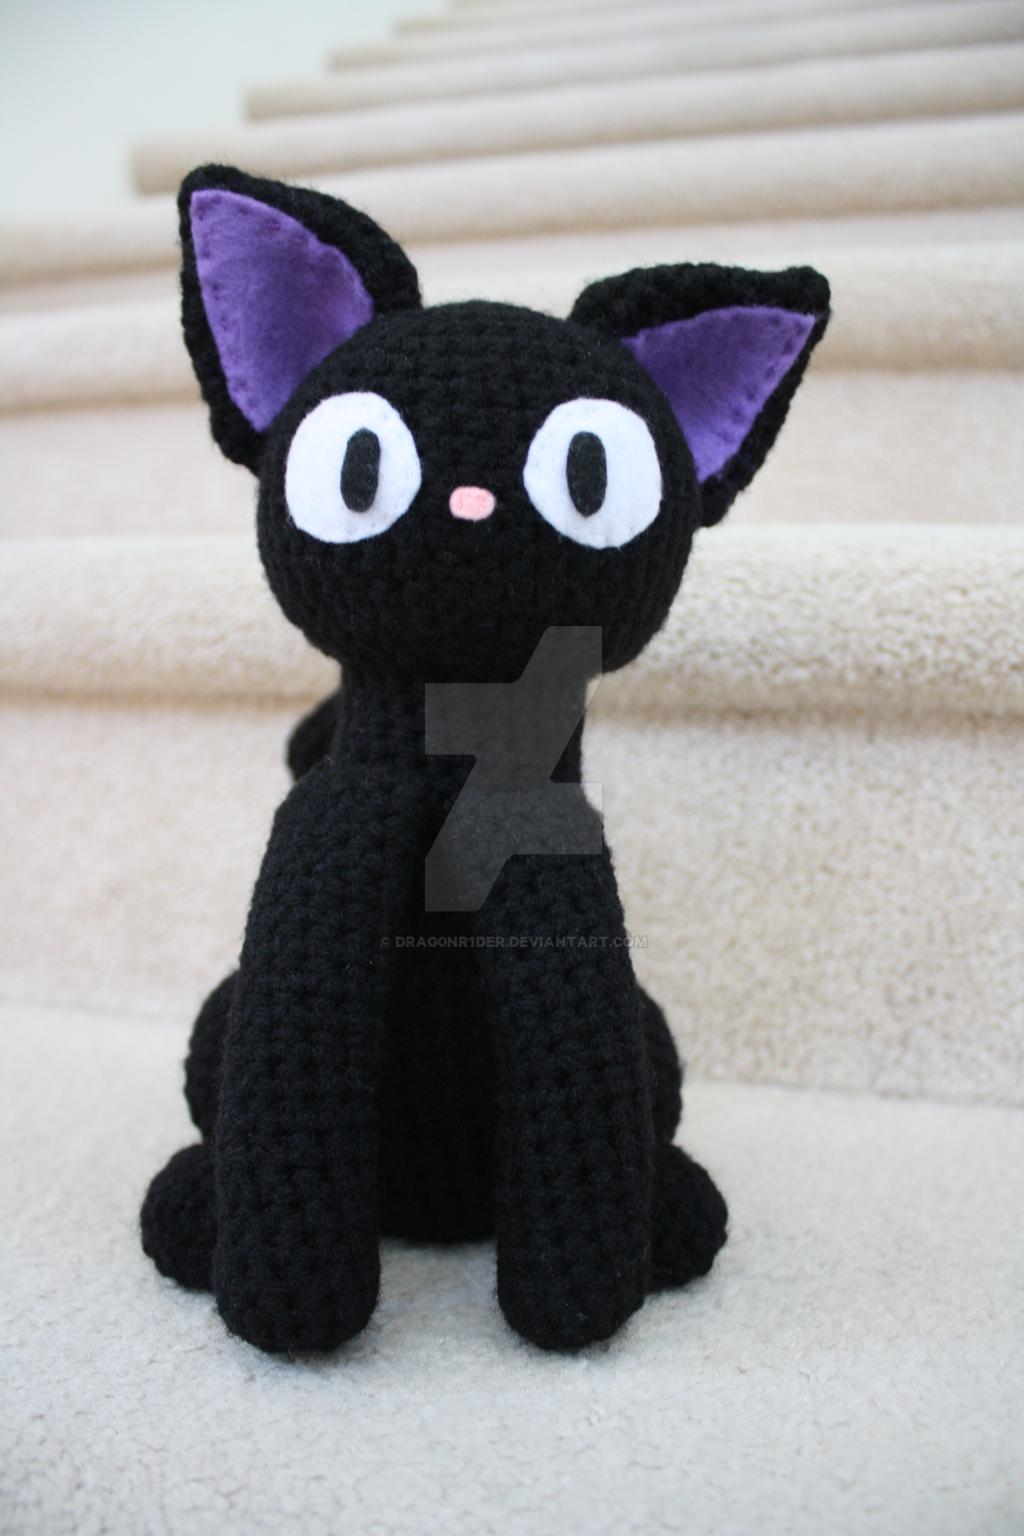 Amigurumi Pattern Free Rabbit : Crochet Jiji - Kikis Delivery Service by drag0nr1der on ...